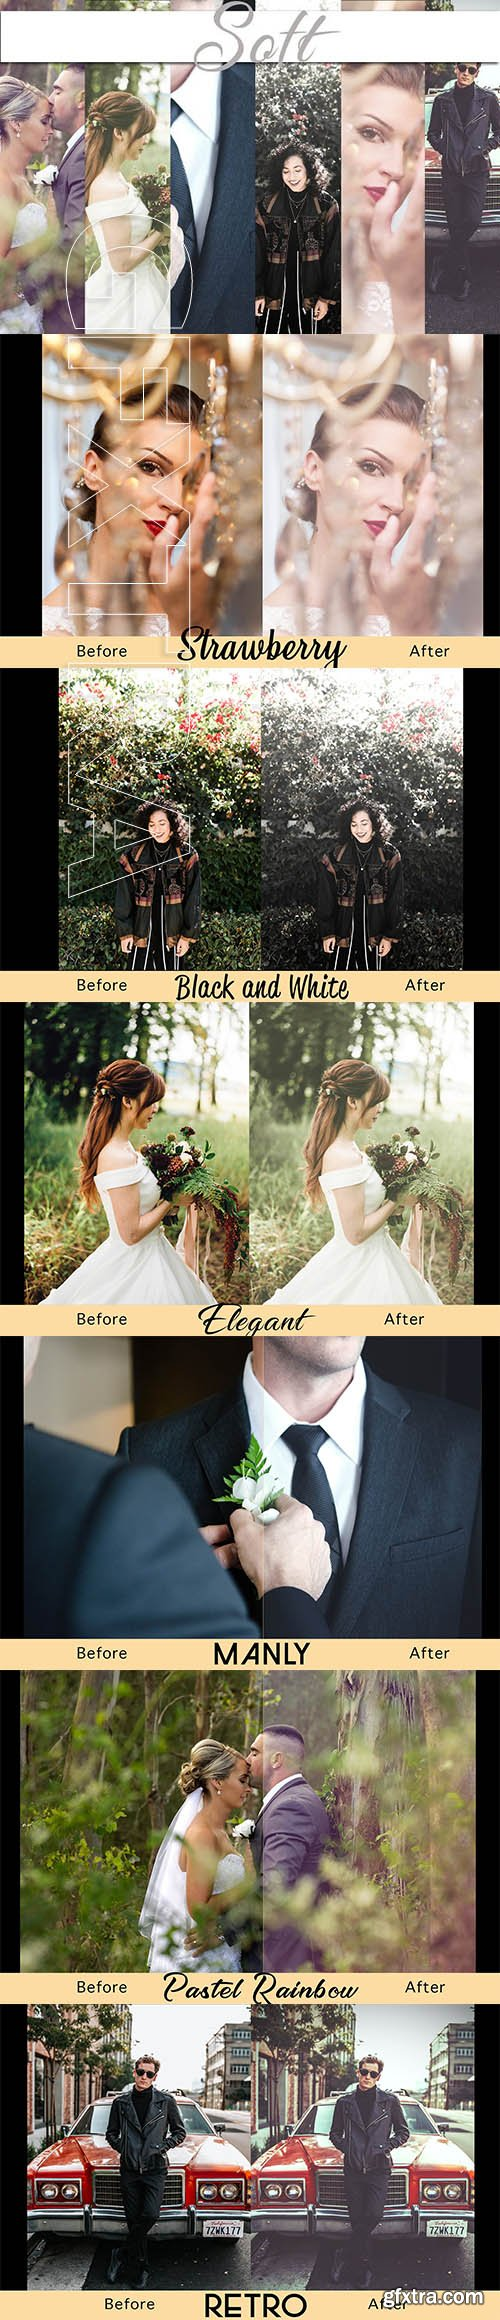 CreativeMarket - Soft - Photoshop Actions 2608802